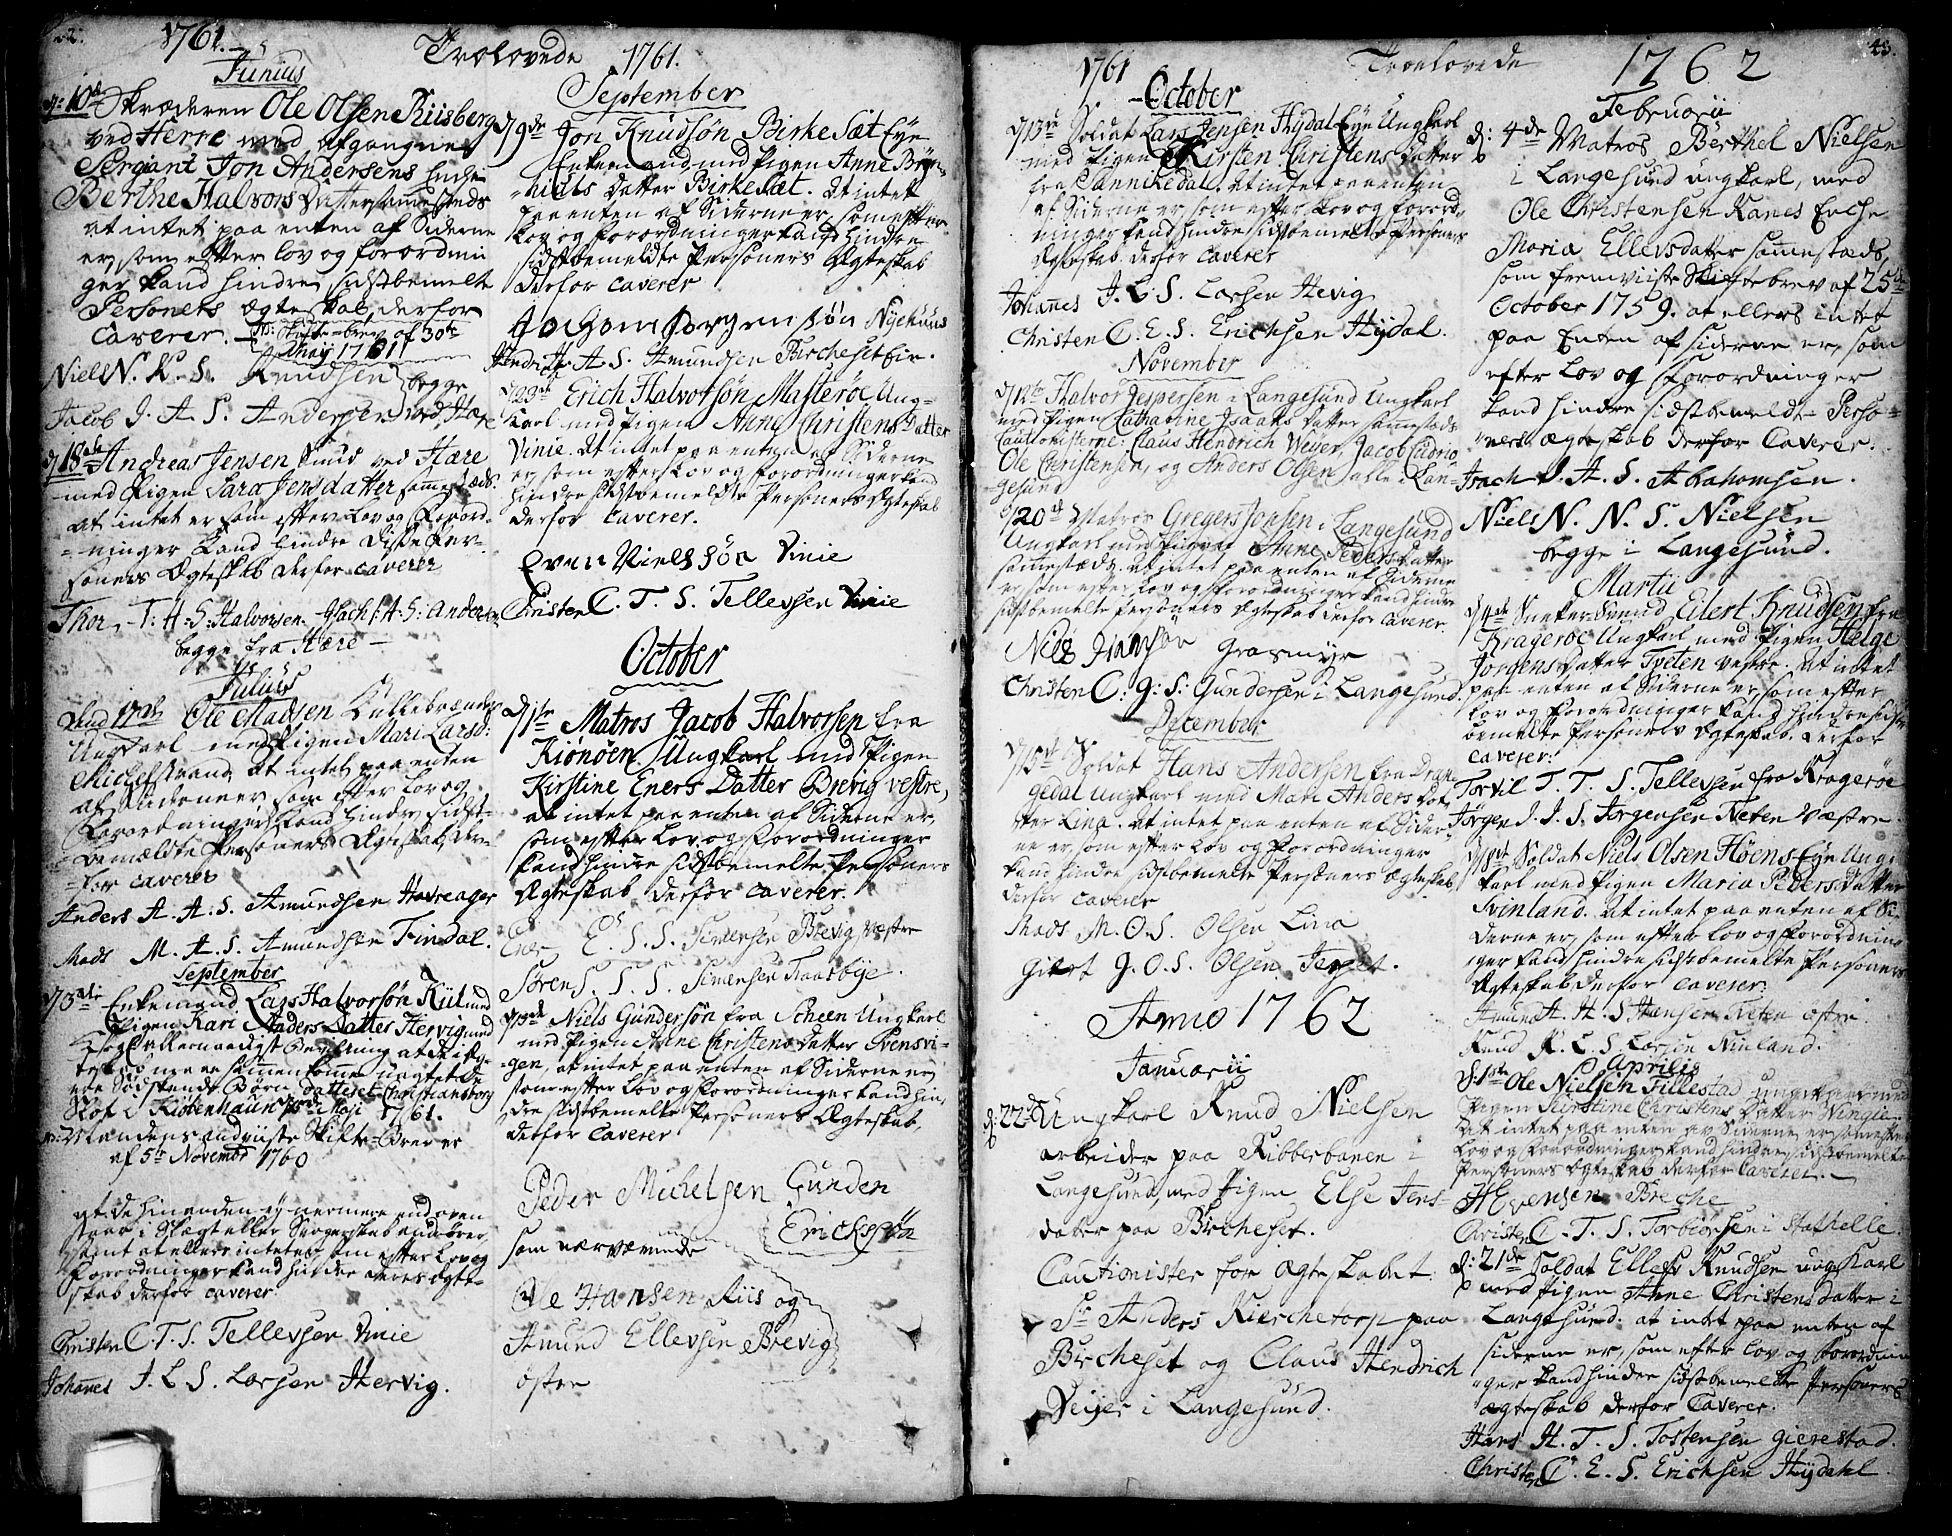 SAKO, Bamble kirkebøker, F/Fa/L0001: Ministerialbok nr. I 1, 1702-1774, s. 42-43